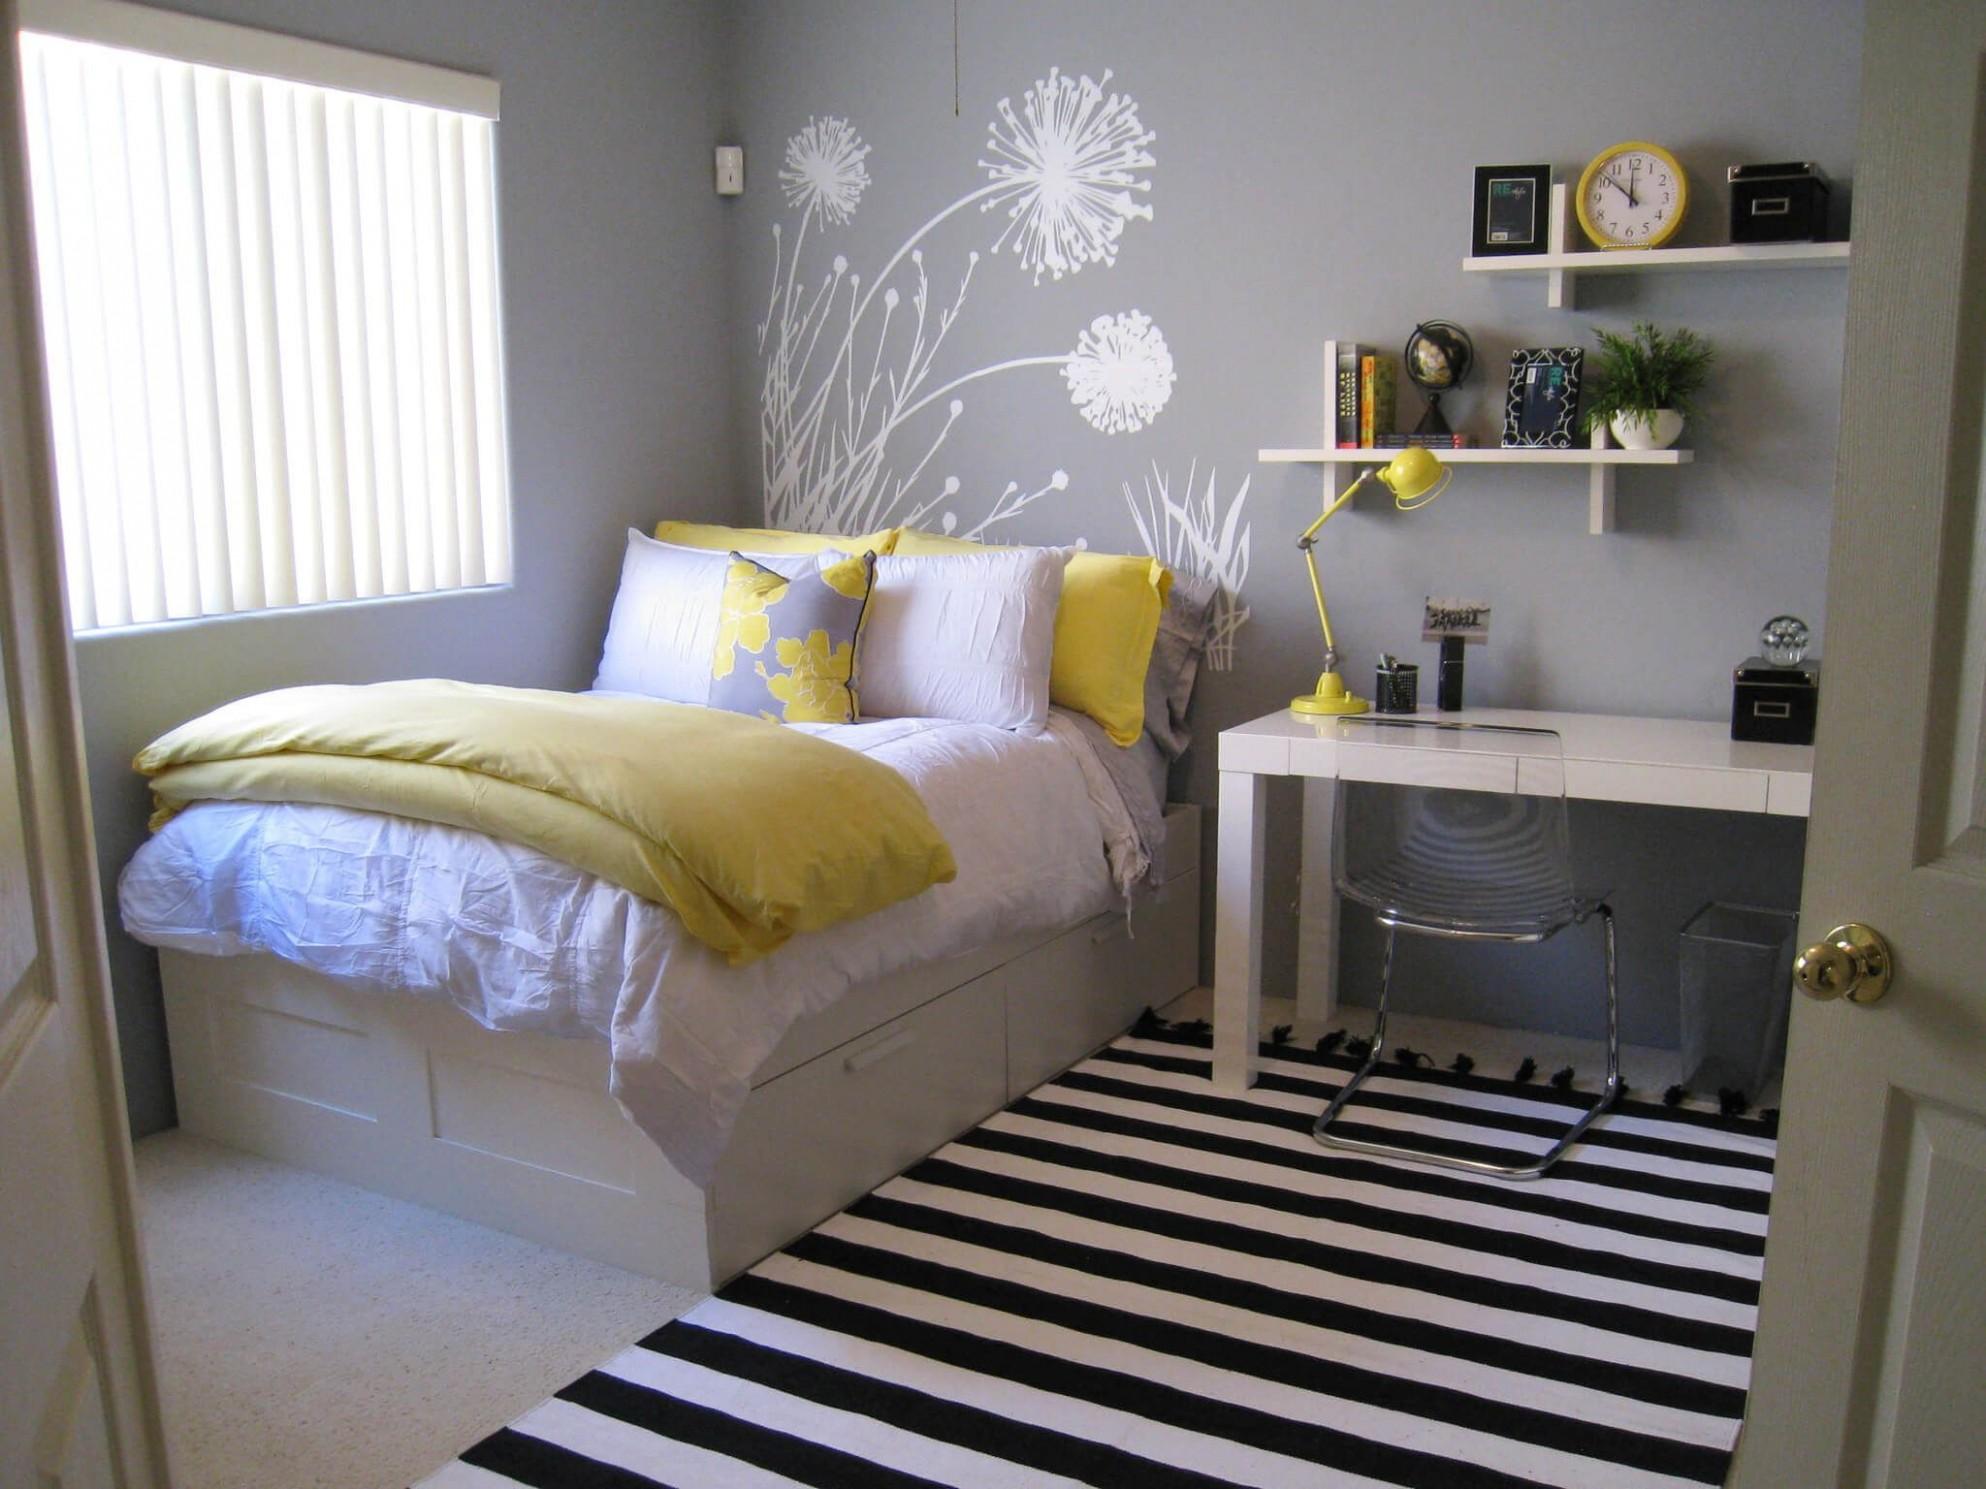 Pin on guestroom - 10X10 Bedroom Ideas